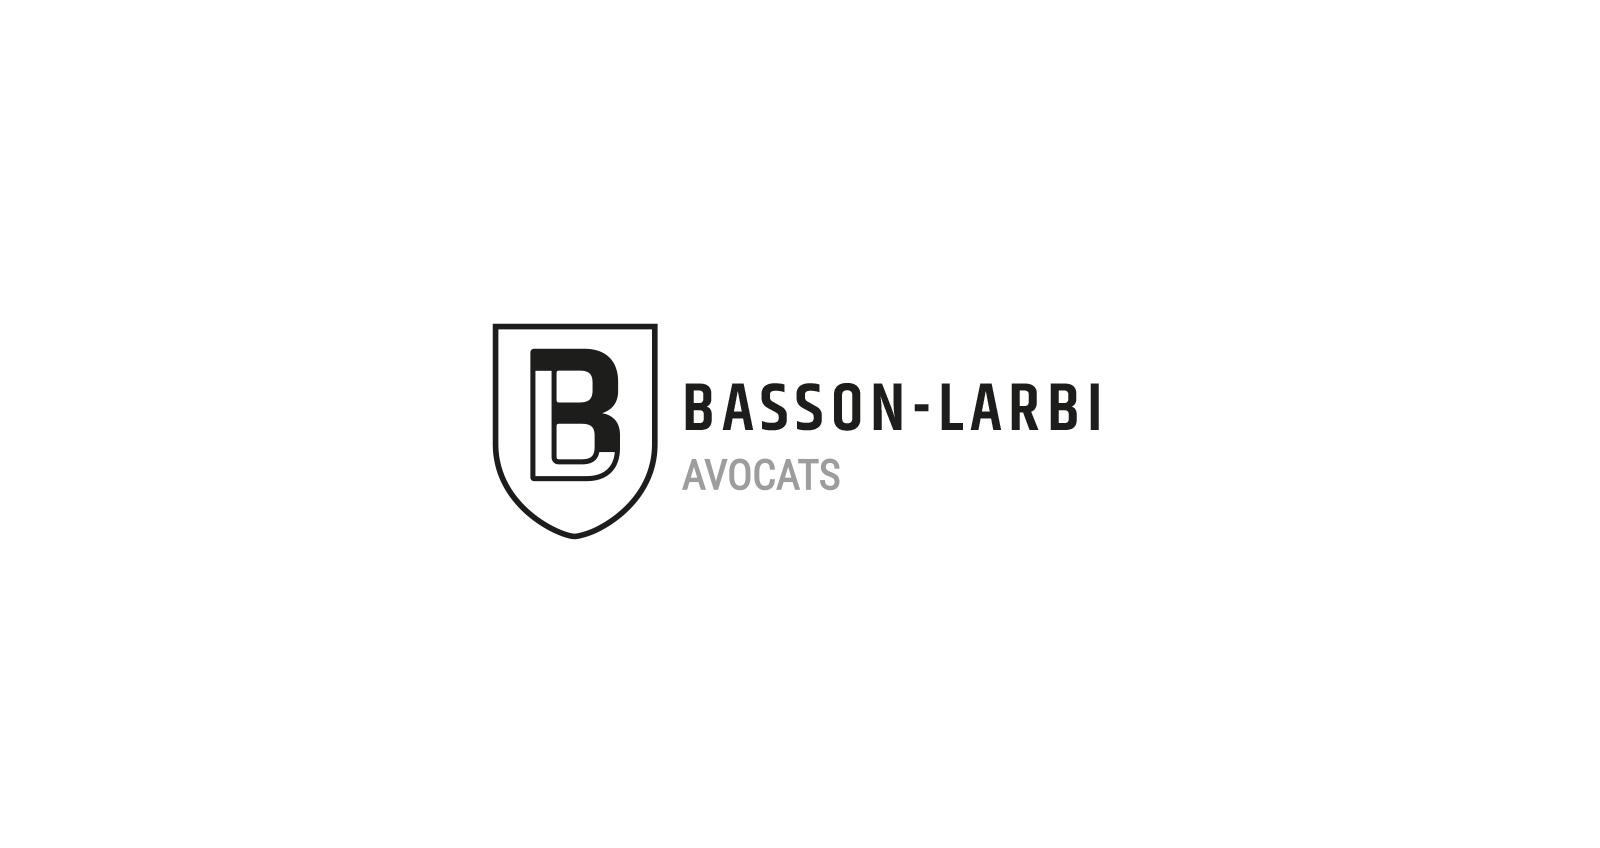 Logo du cabinet d'avocats Basson-Larbi Avocats - Studio-EVOL